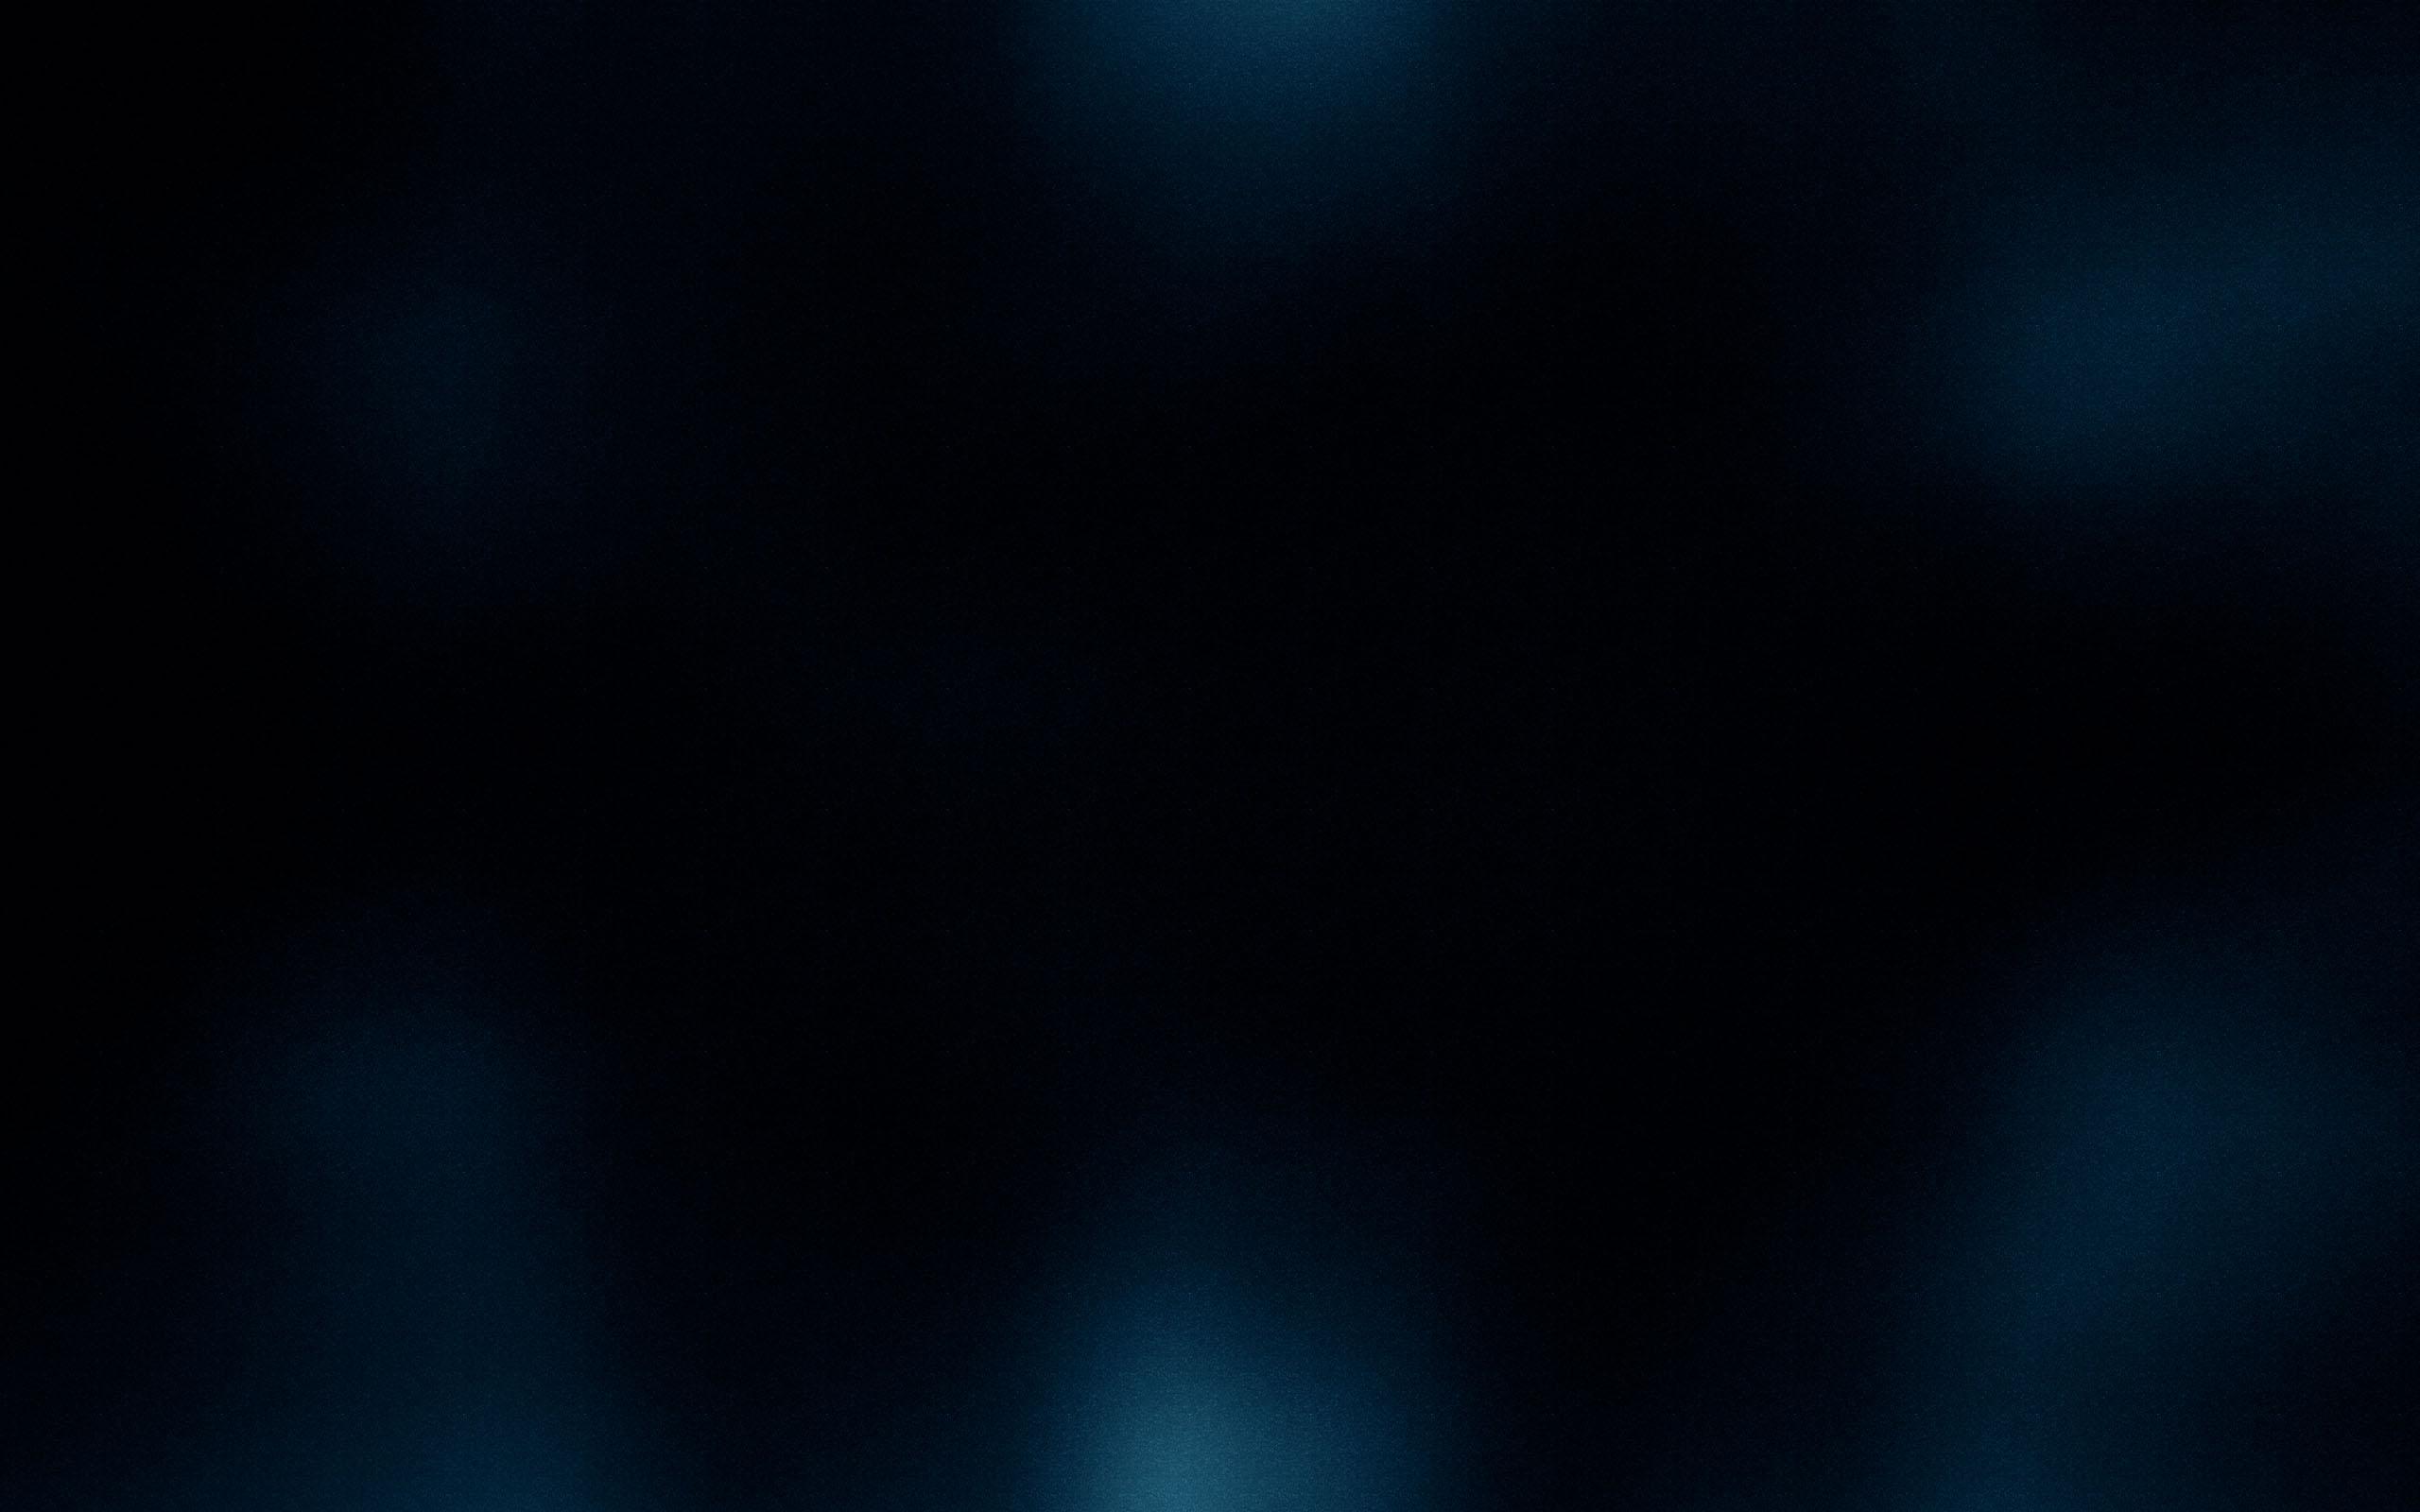 Mac Wallpapers Abstract Dark Background Mac Abstract Wallpaper Mac 2560x1600